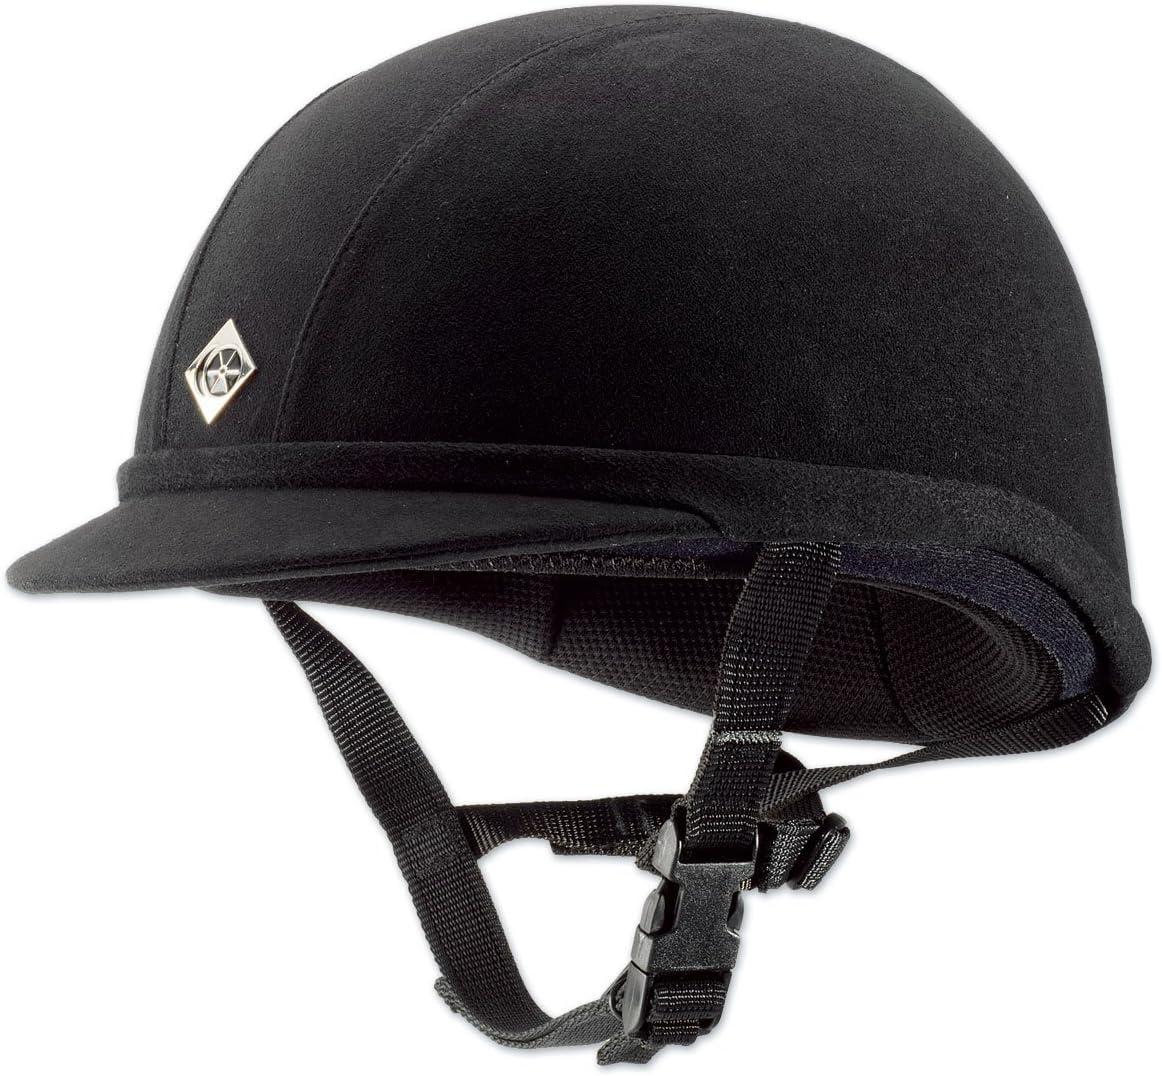 Charles Owen Discount Limited Special Price mail order jR8 Helmet 1 7 4 Black